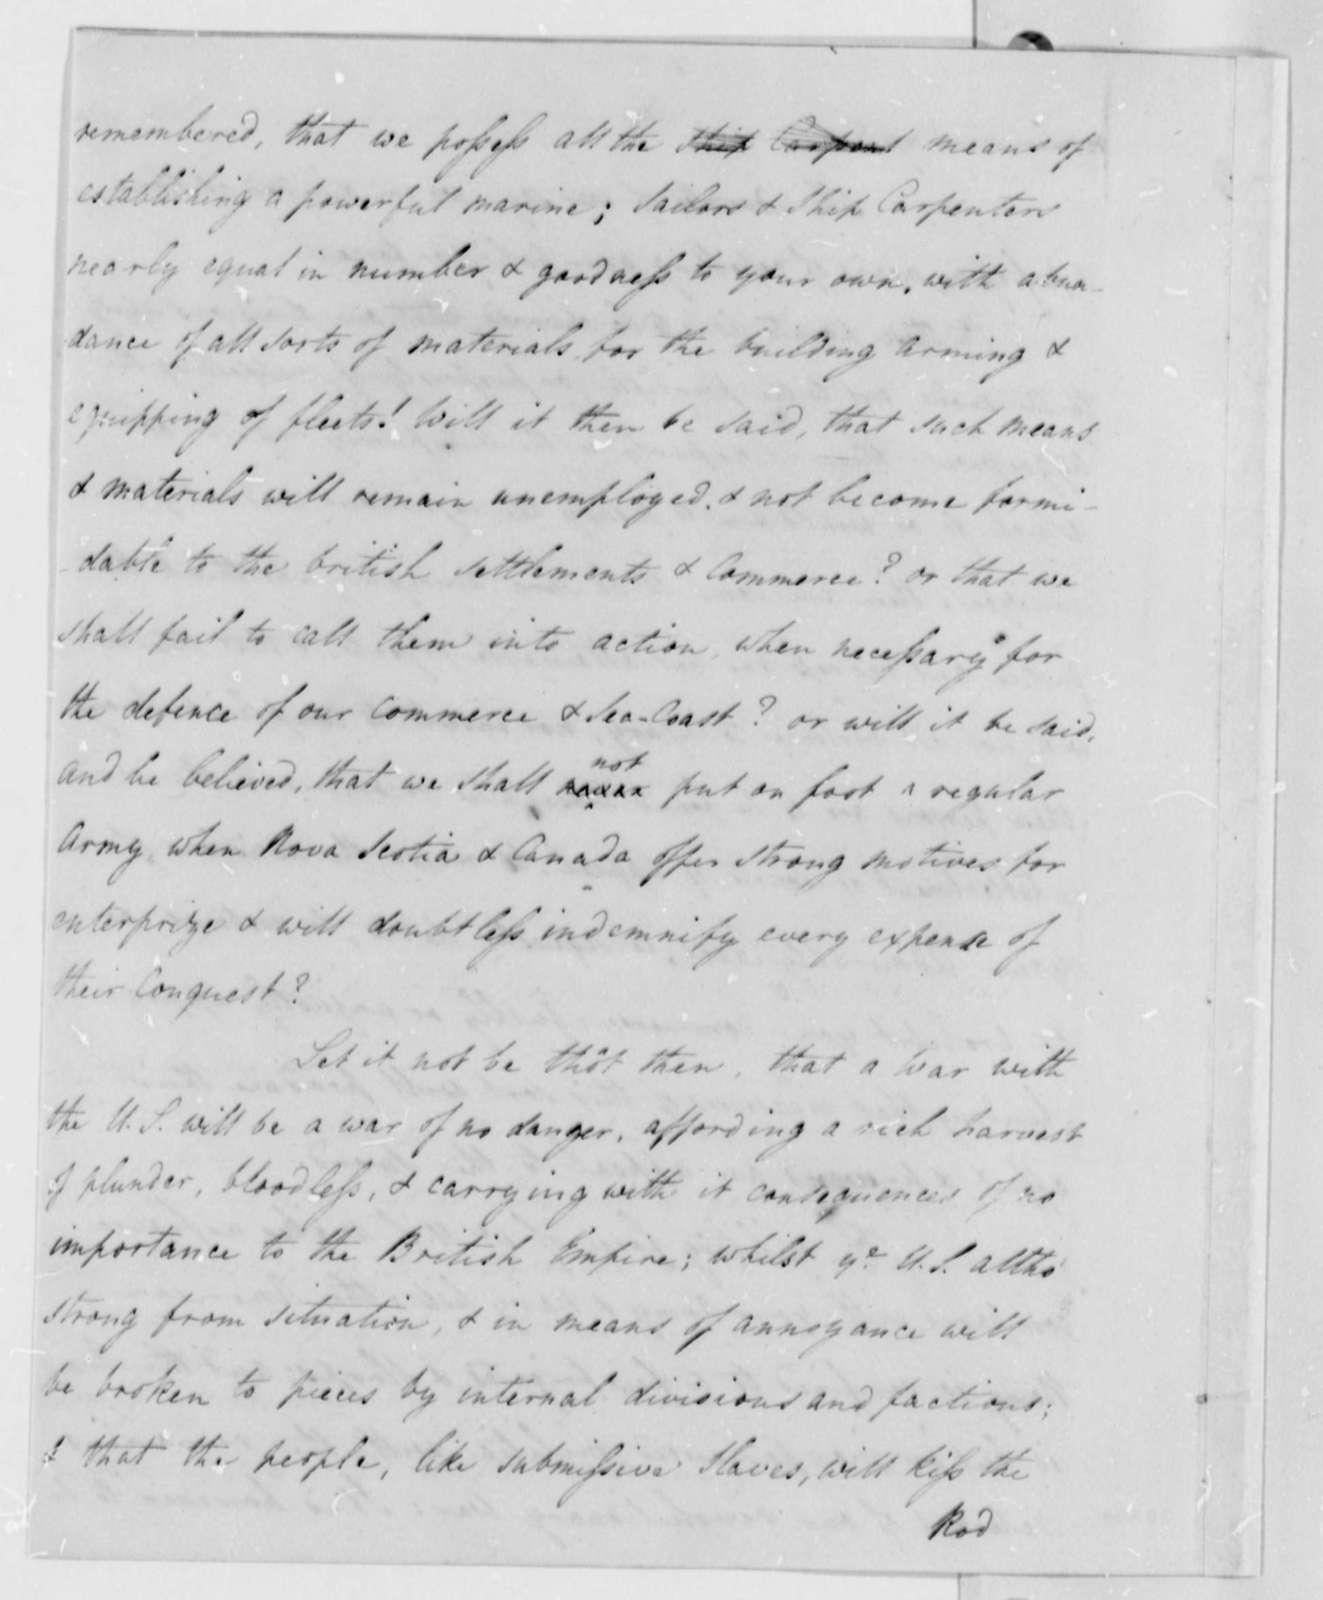 James Bowdoin to David Williams, February 5, 1808